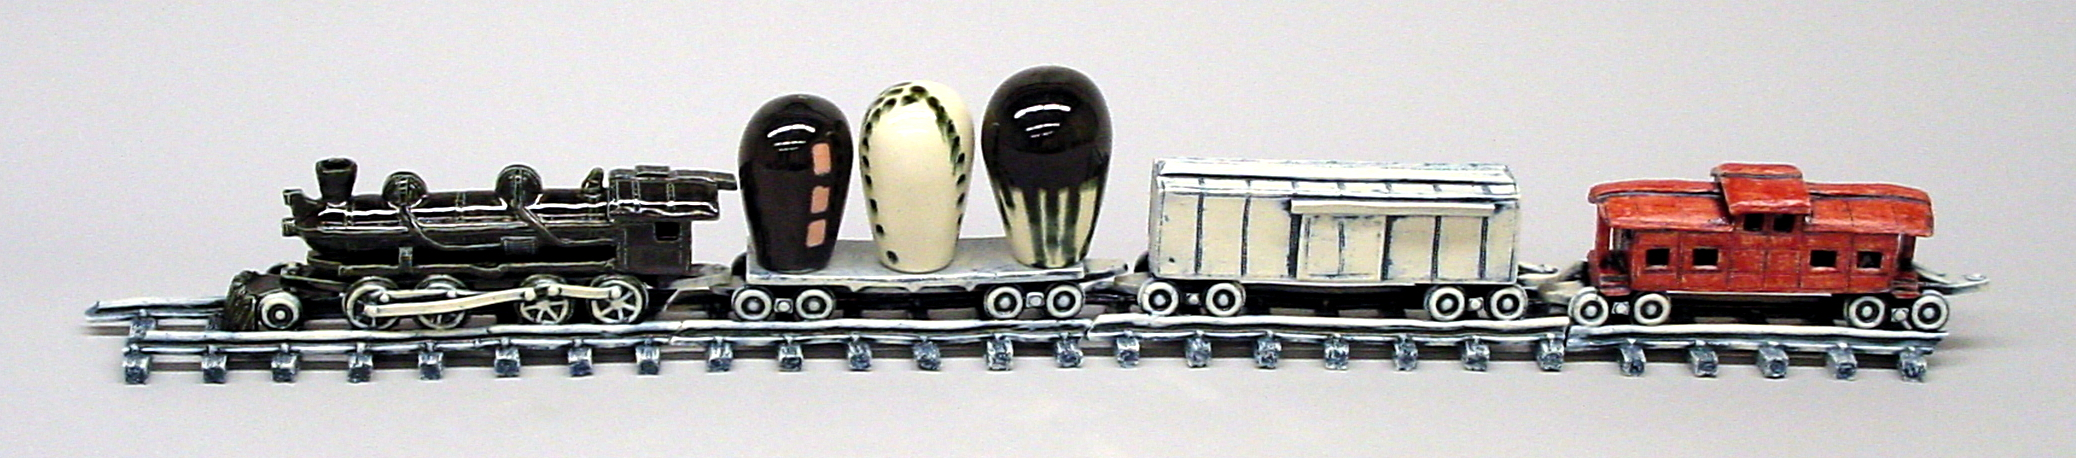 Art Train (homage to Kaneko)